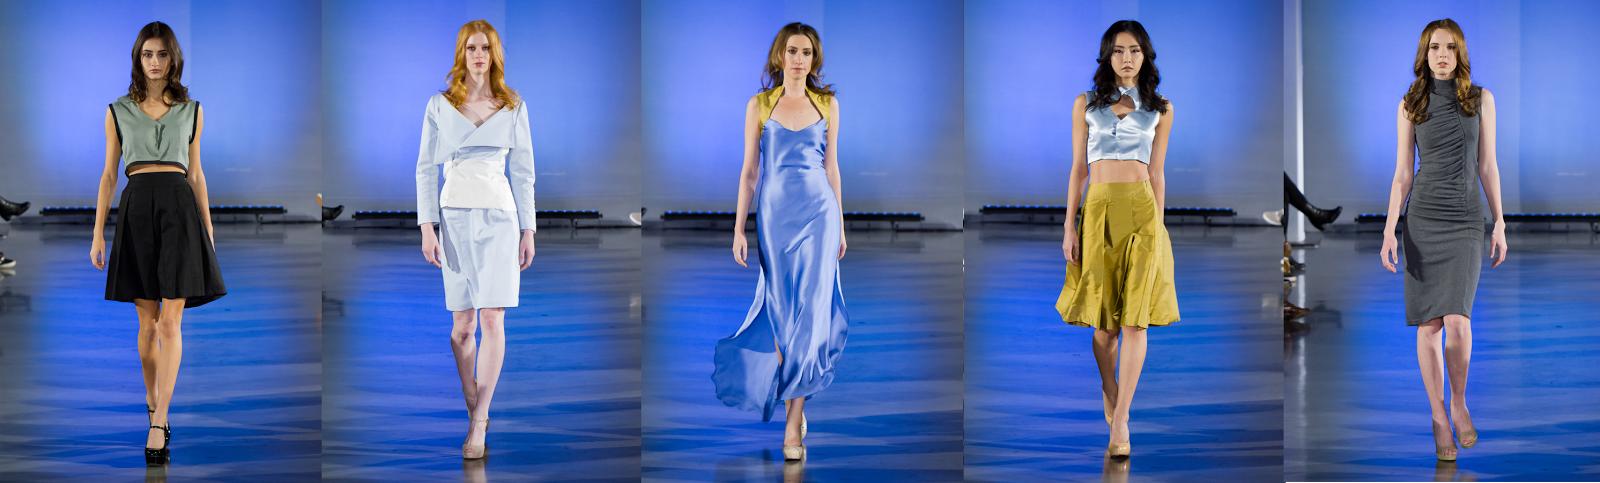 Internships In Vancouver Fashion Week